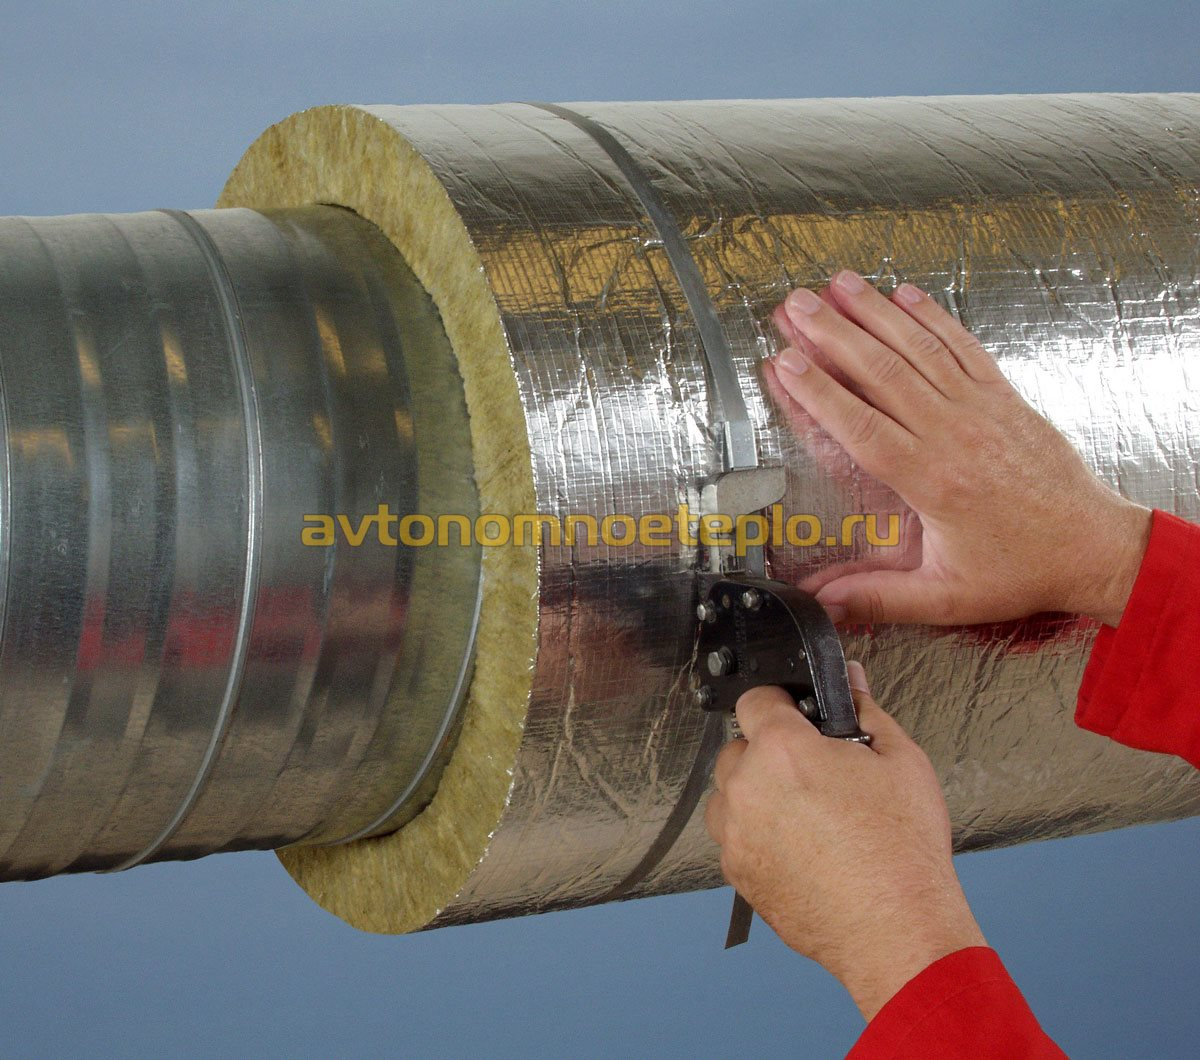 Каменная труба для дымохода дымоход украина купить